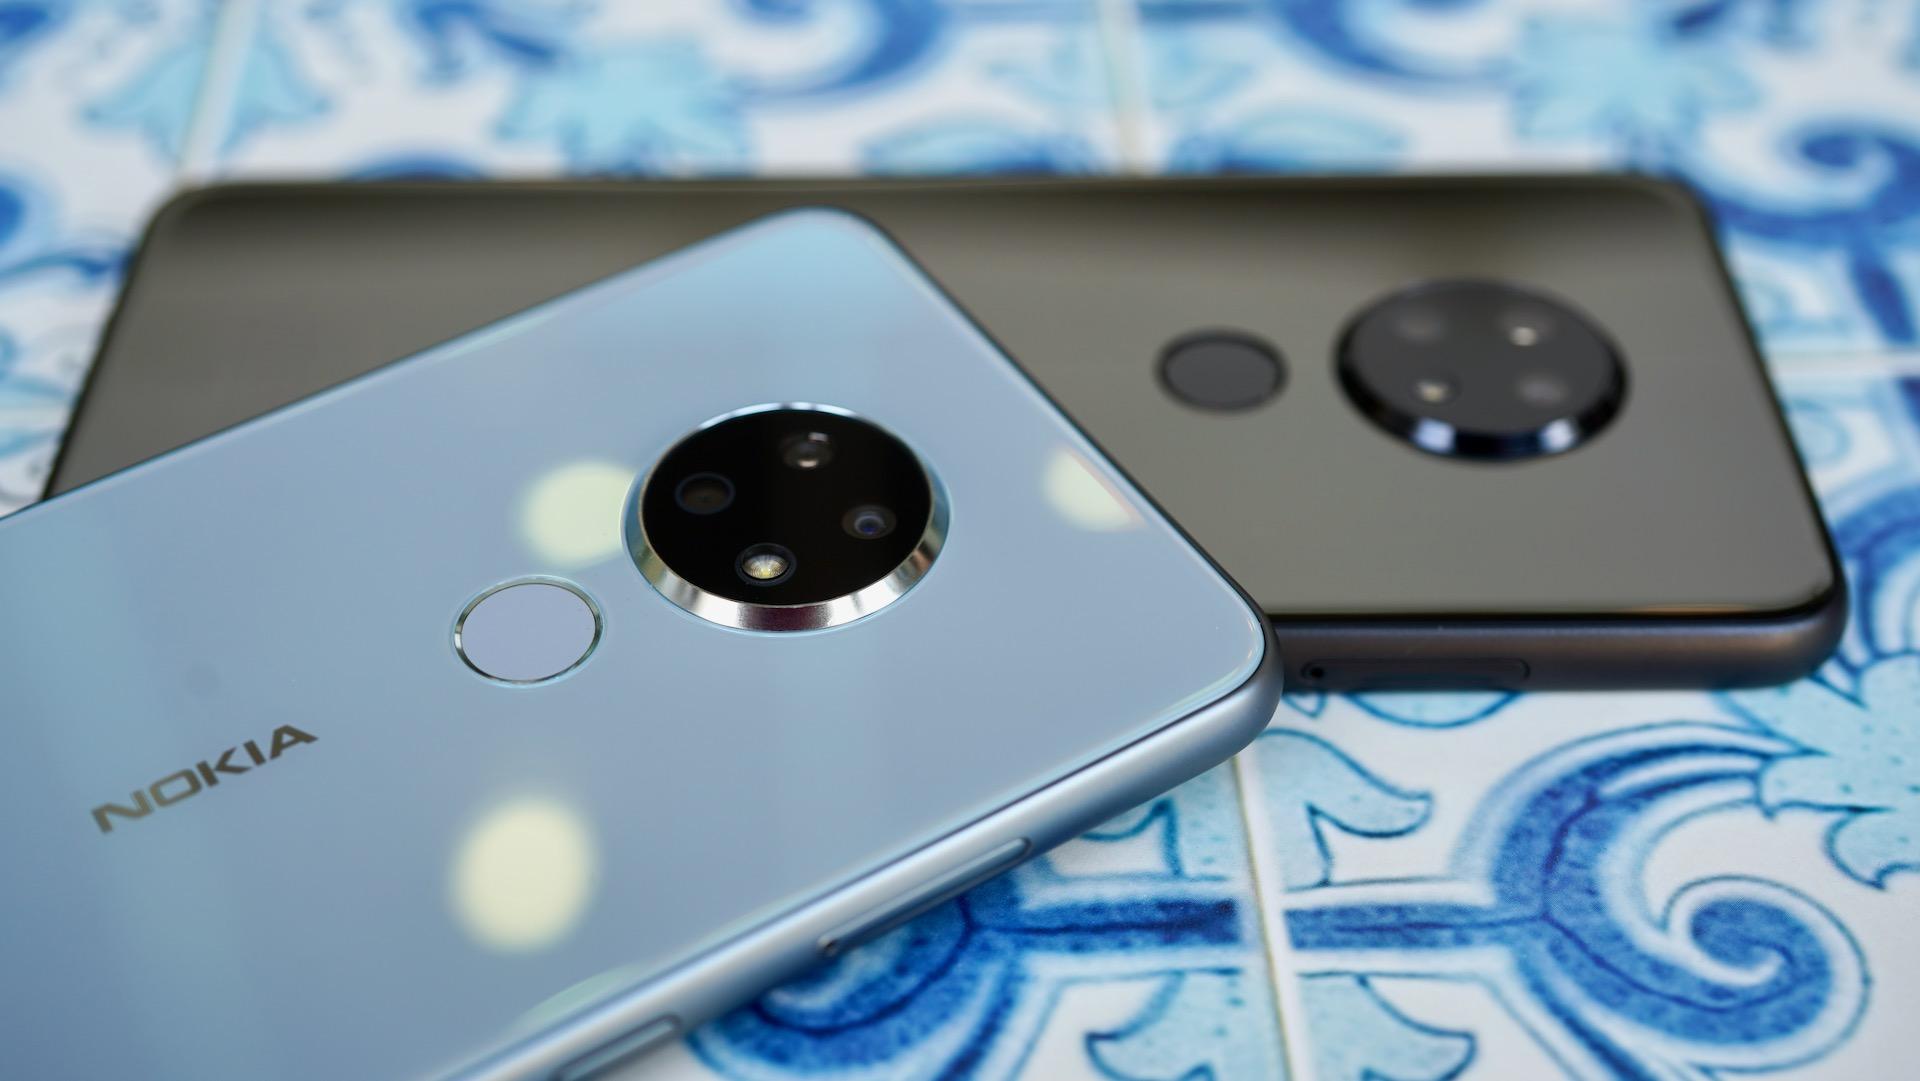 Nokia 6 2020 Review.Hmd Global Debuts Two Killer Mid Range Nokia Phones